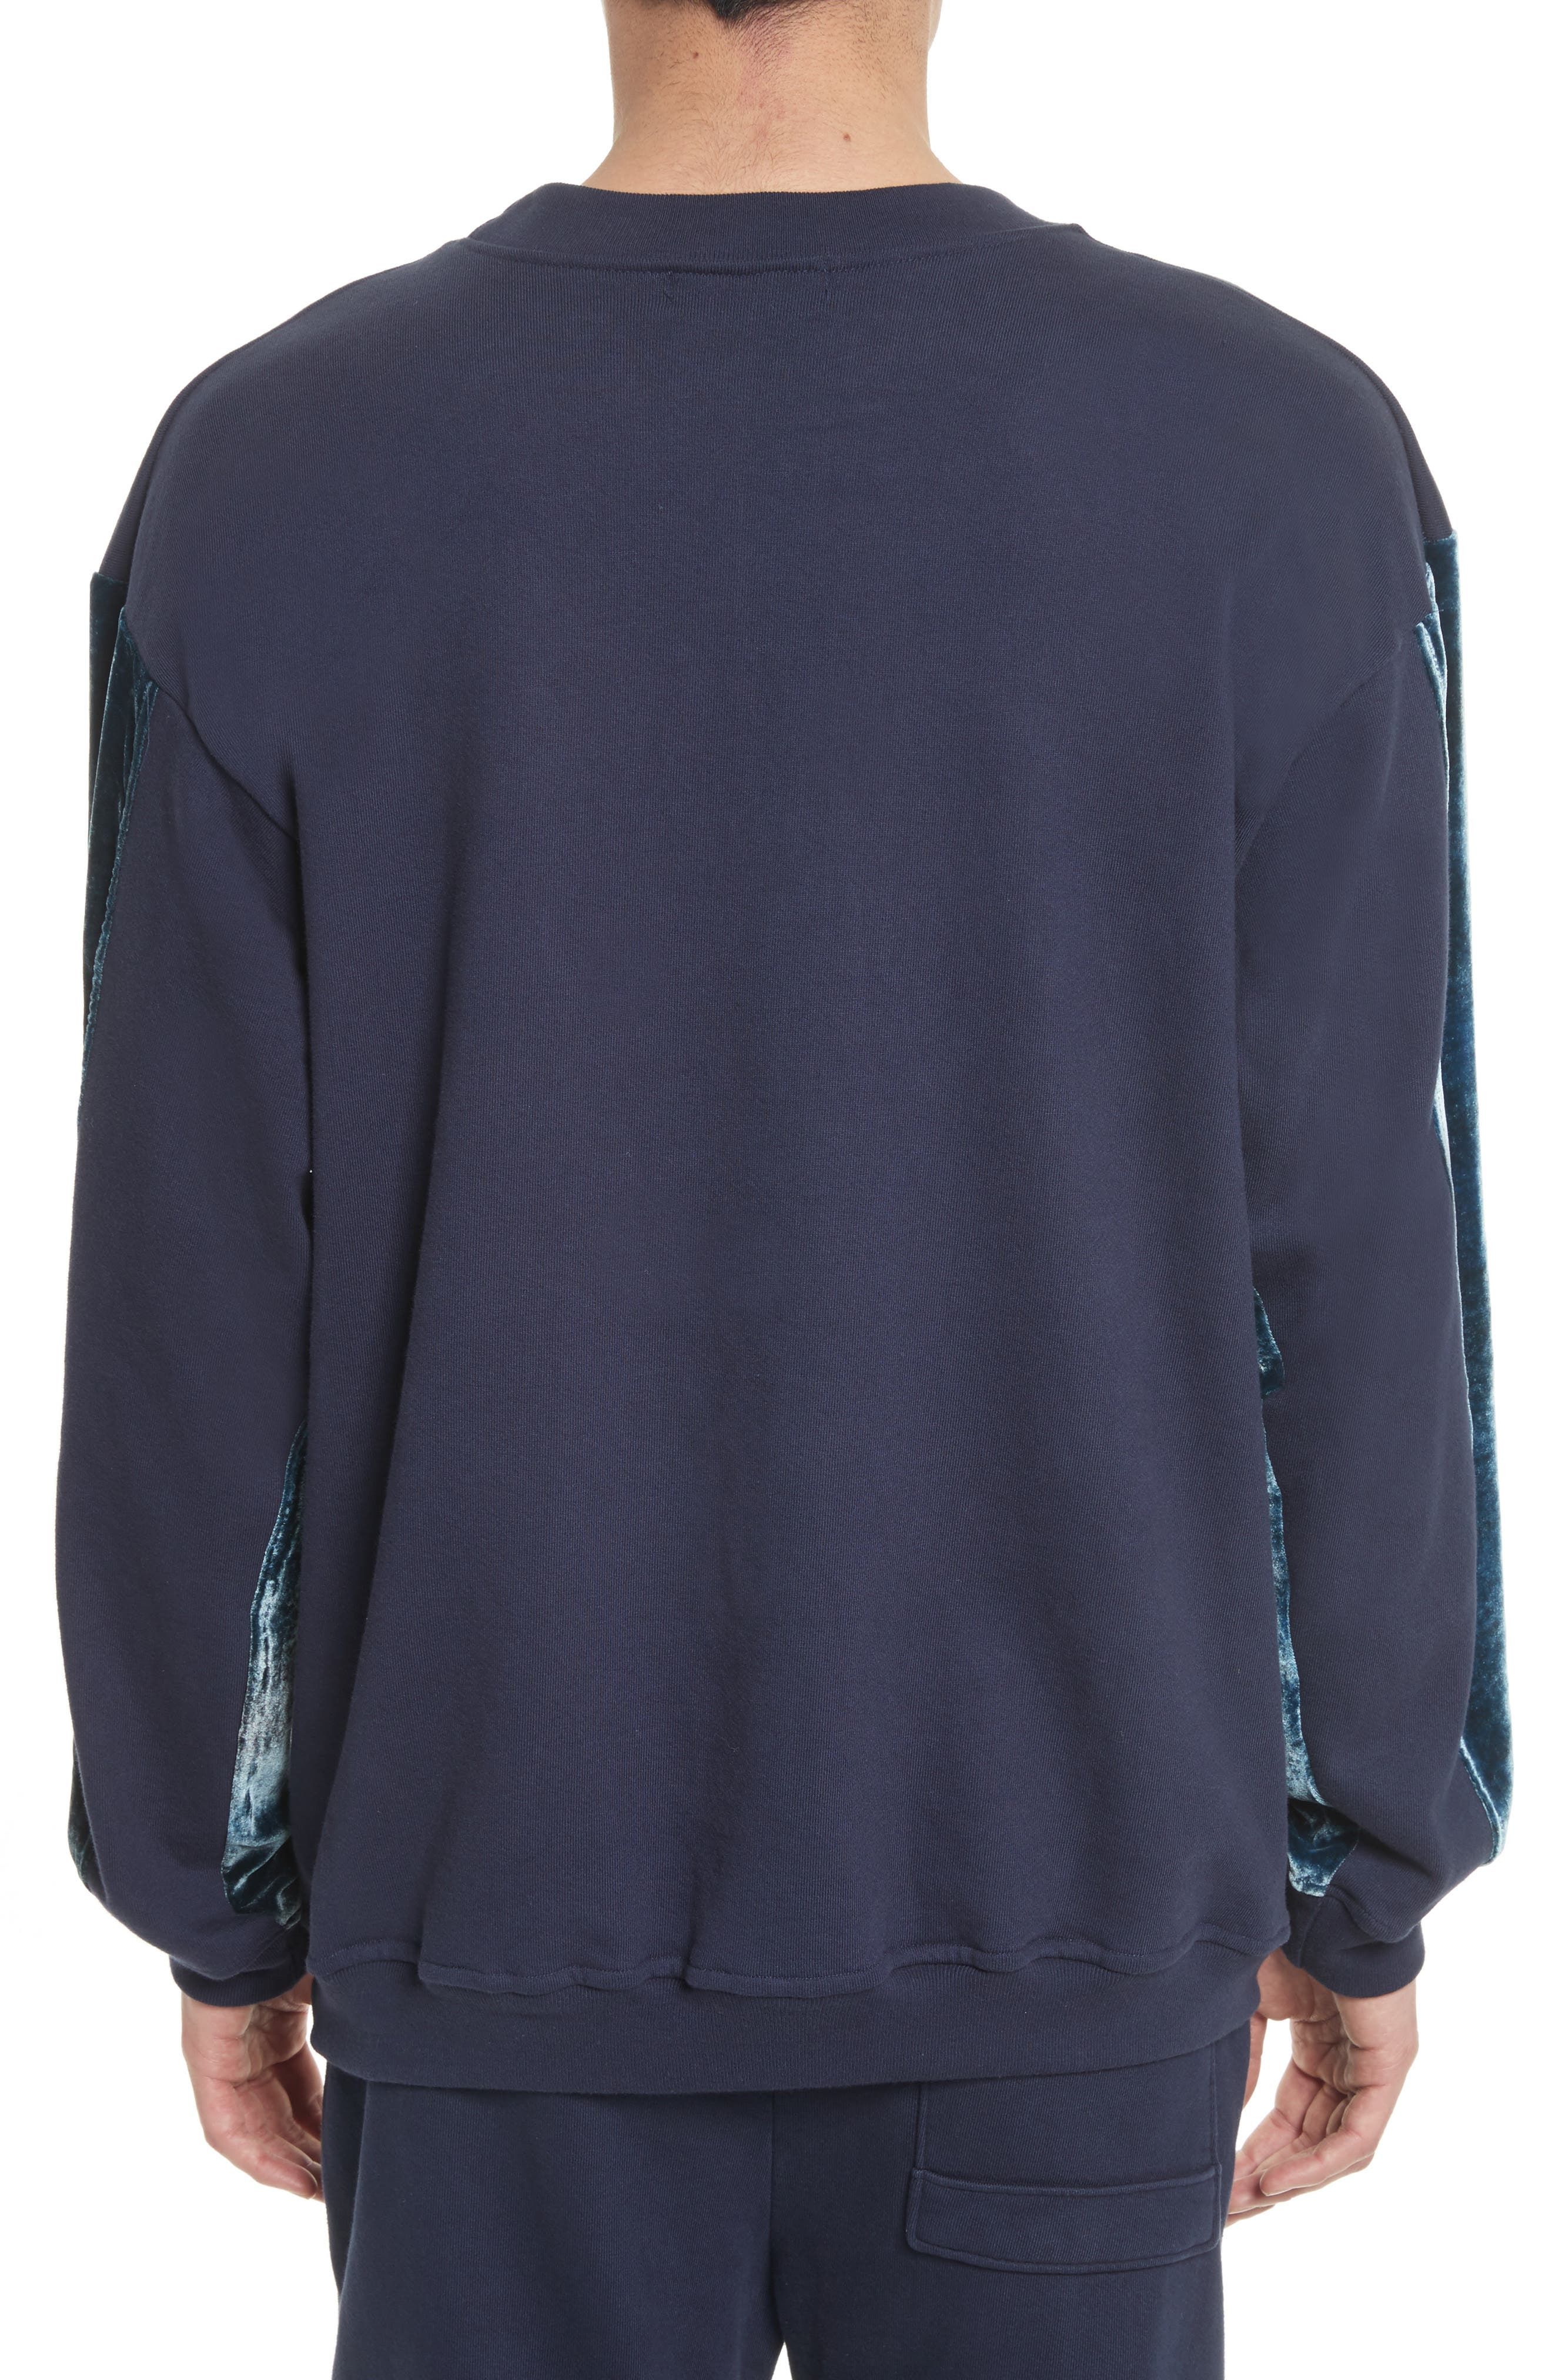 Alternate Image 2  - Drifter Galeras Velvet Sleeve Sweatshirt